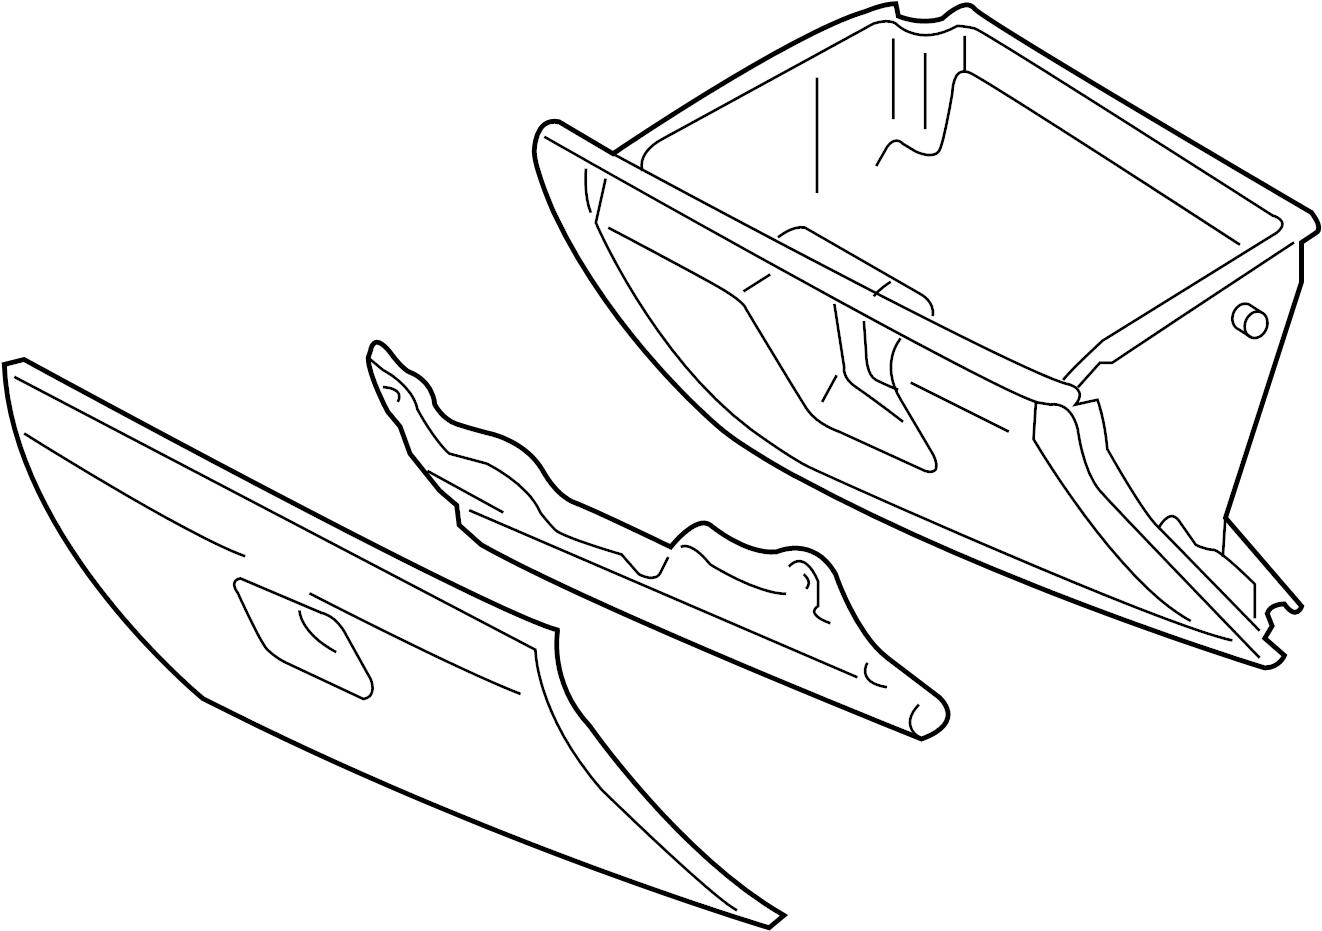 Mazda RX-8 Glove Box. PANEL, INSTRUMENT, Front, Body, Assy